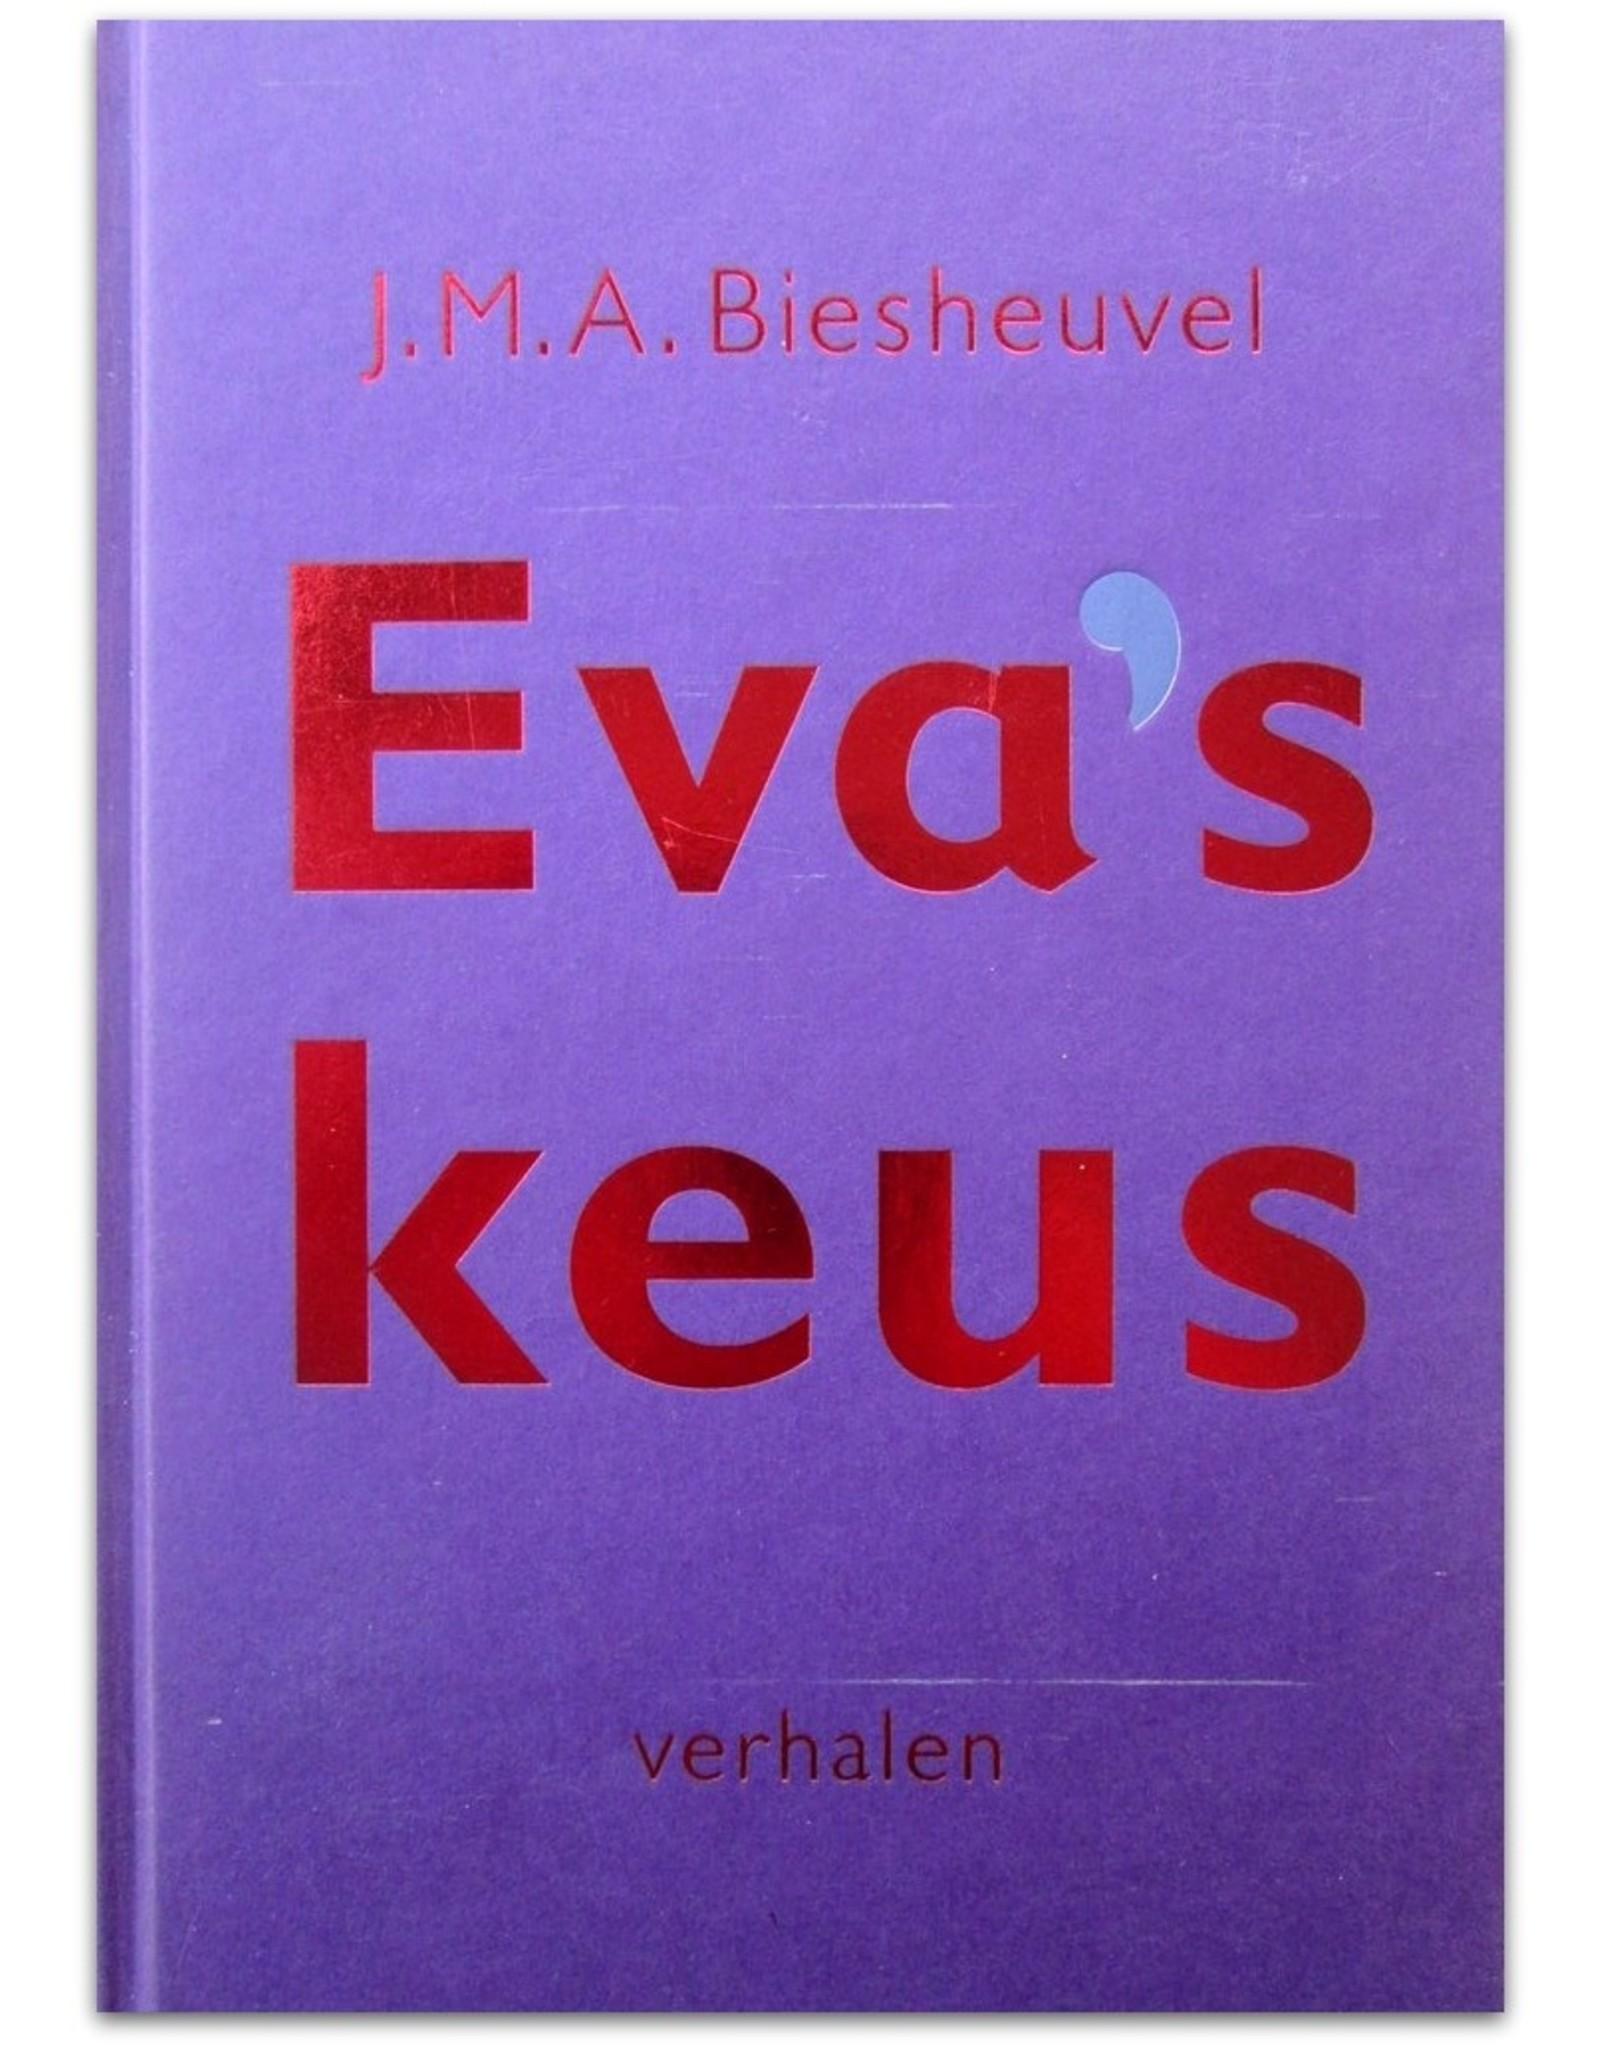 J.M.A. Biesheuvel - Eva's keus. Verhalen